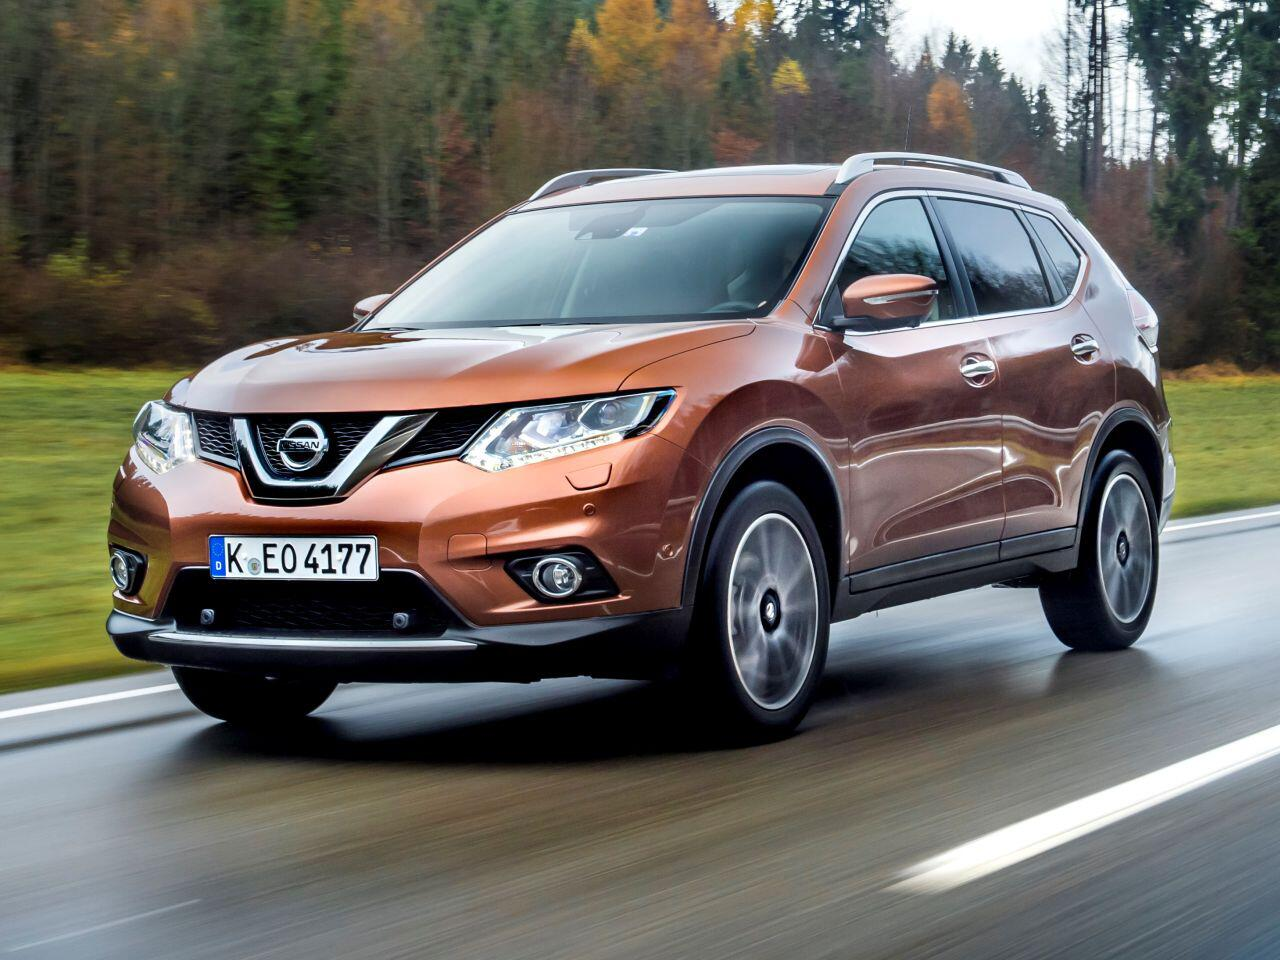 Bild zu Platz 12: Nissan X-Trail